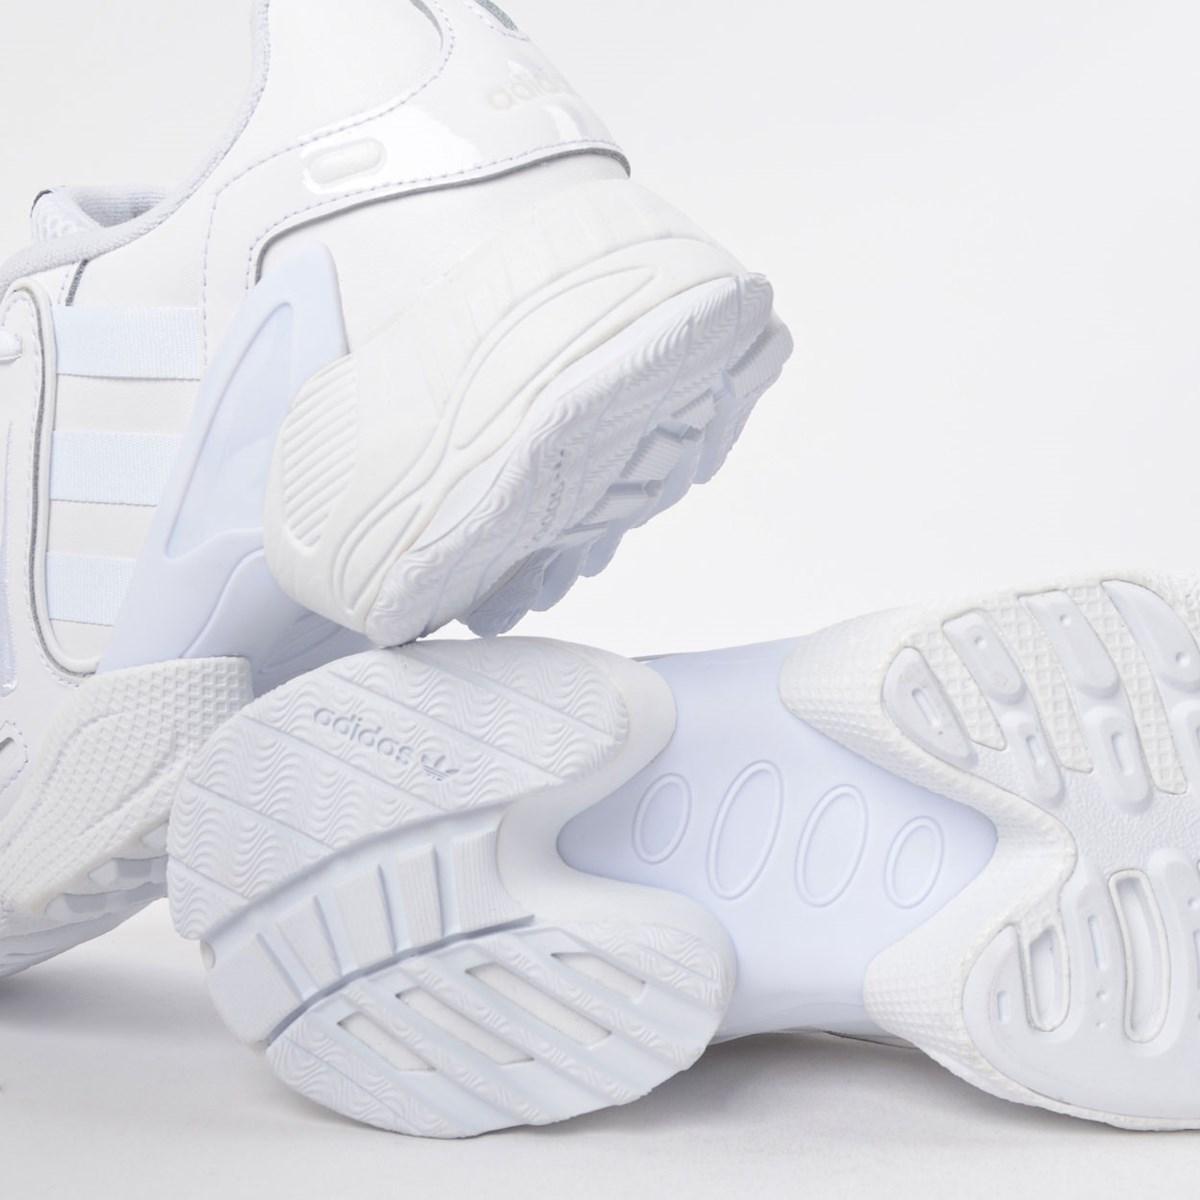 Tênis Adidas EQT Gazelle W White EF5313